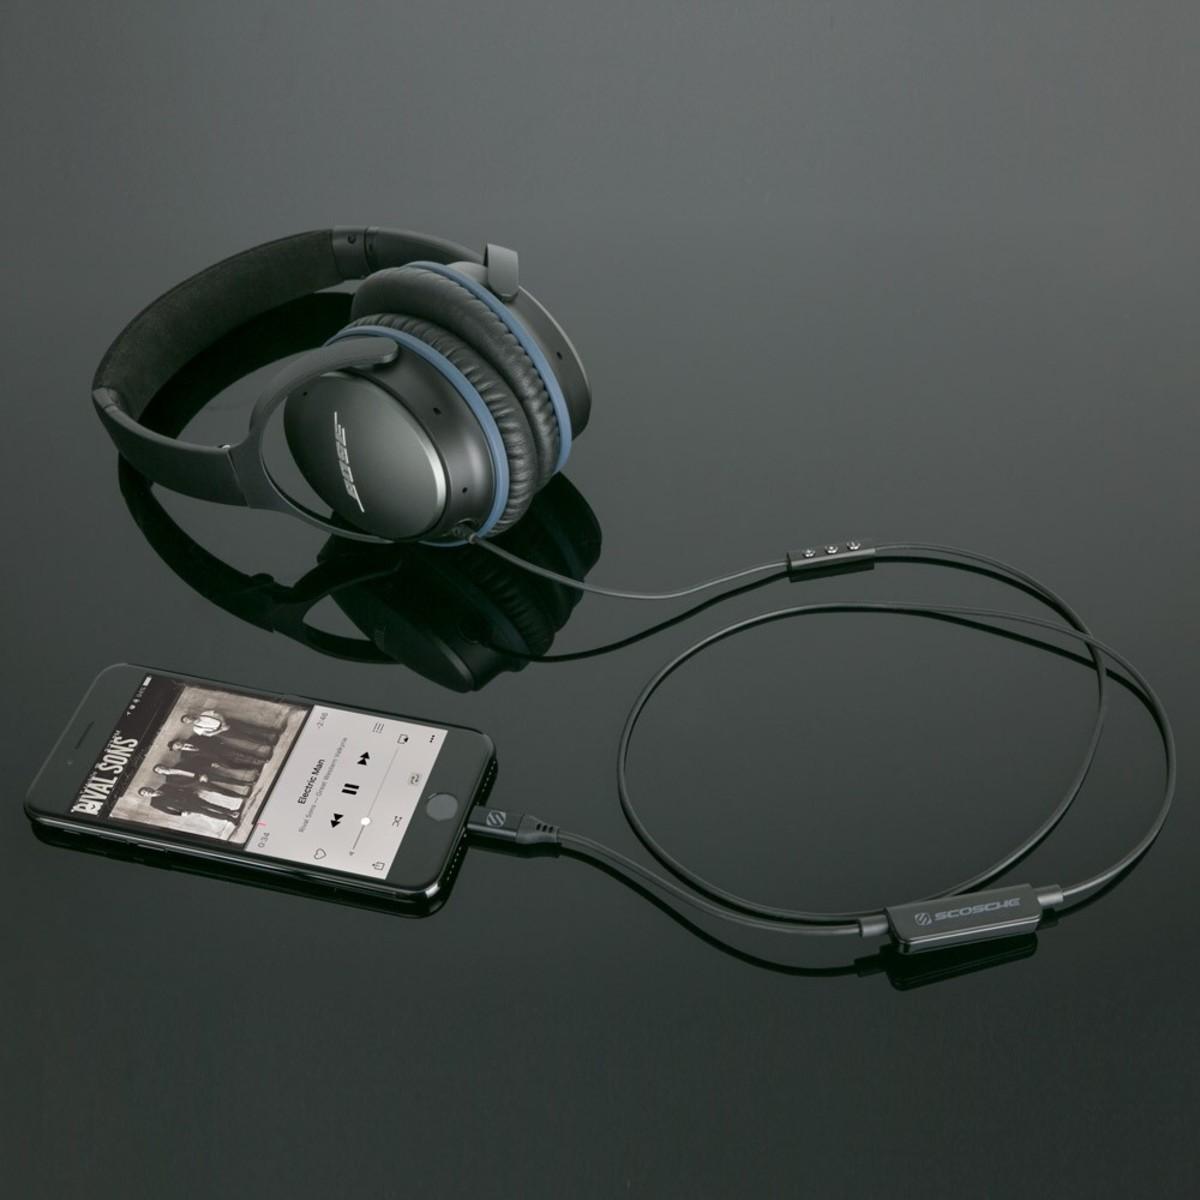 Bose Lightning Adapter